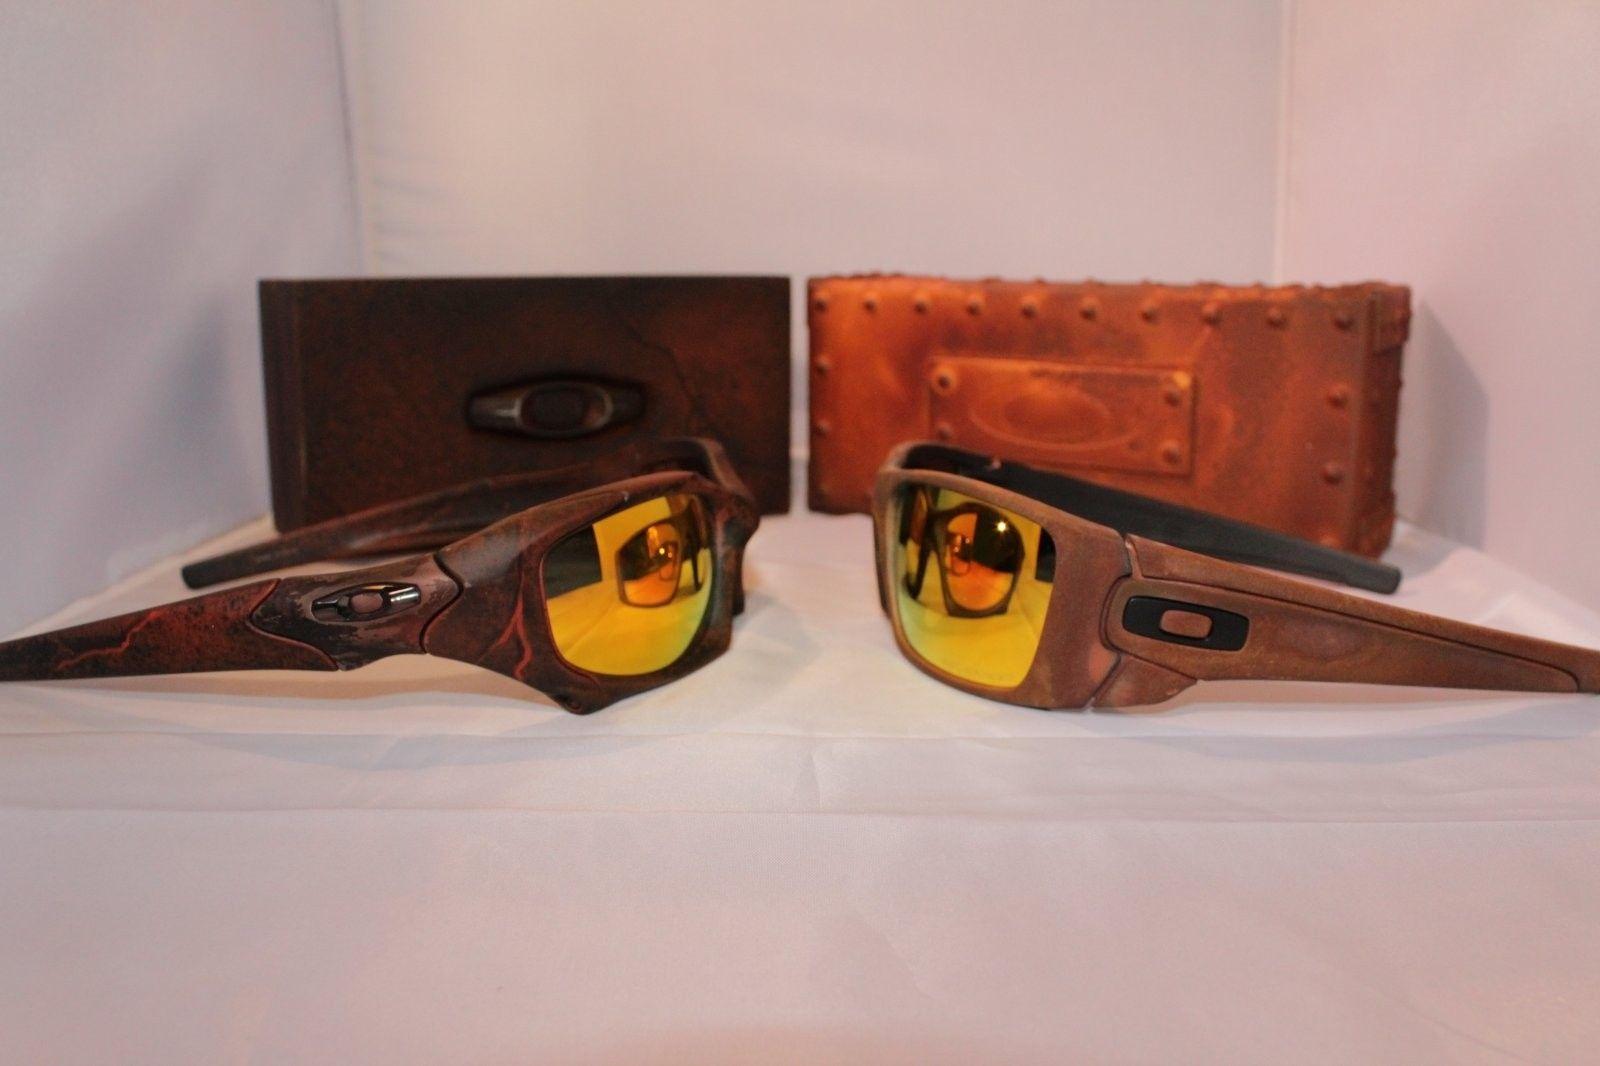 Custom Magma/Decay Pit Boss 1, Dr Chop Dirty Dog, Rust Face Off - oakley pics 10-24-14 (55).JPG